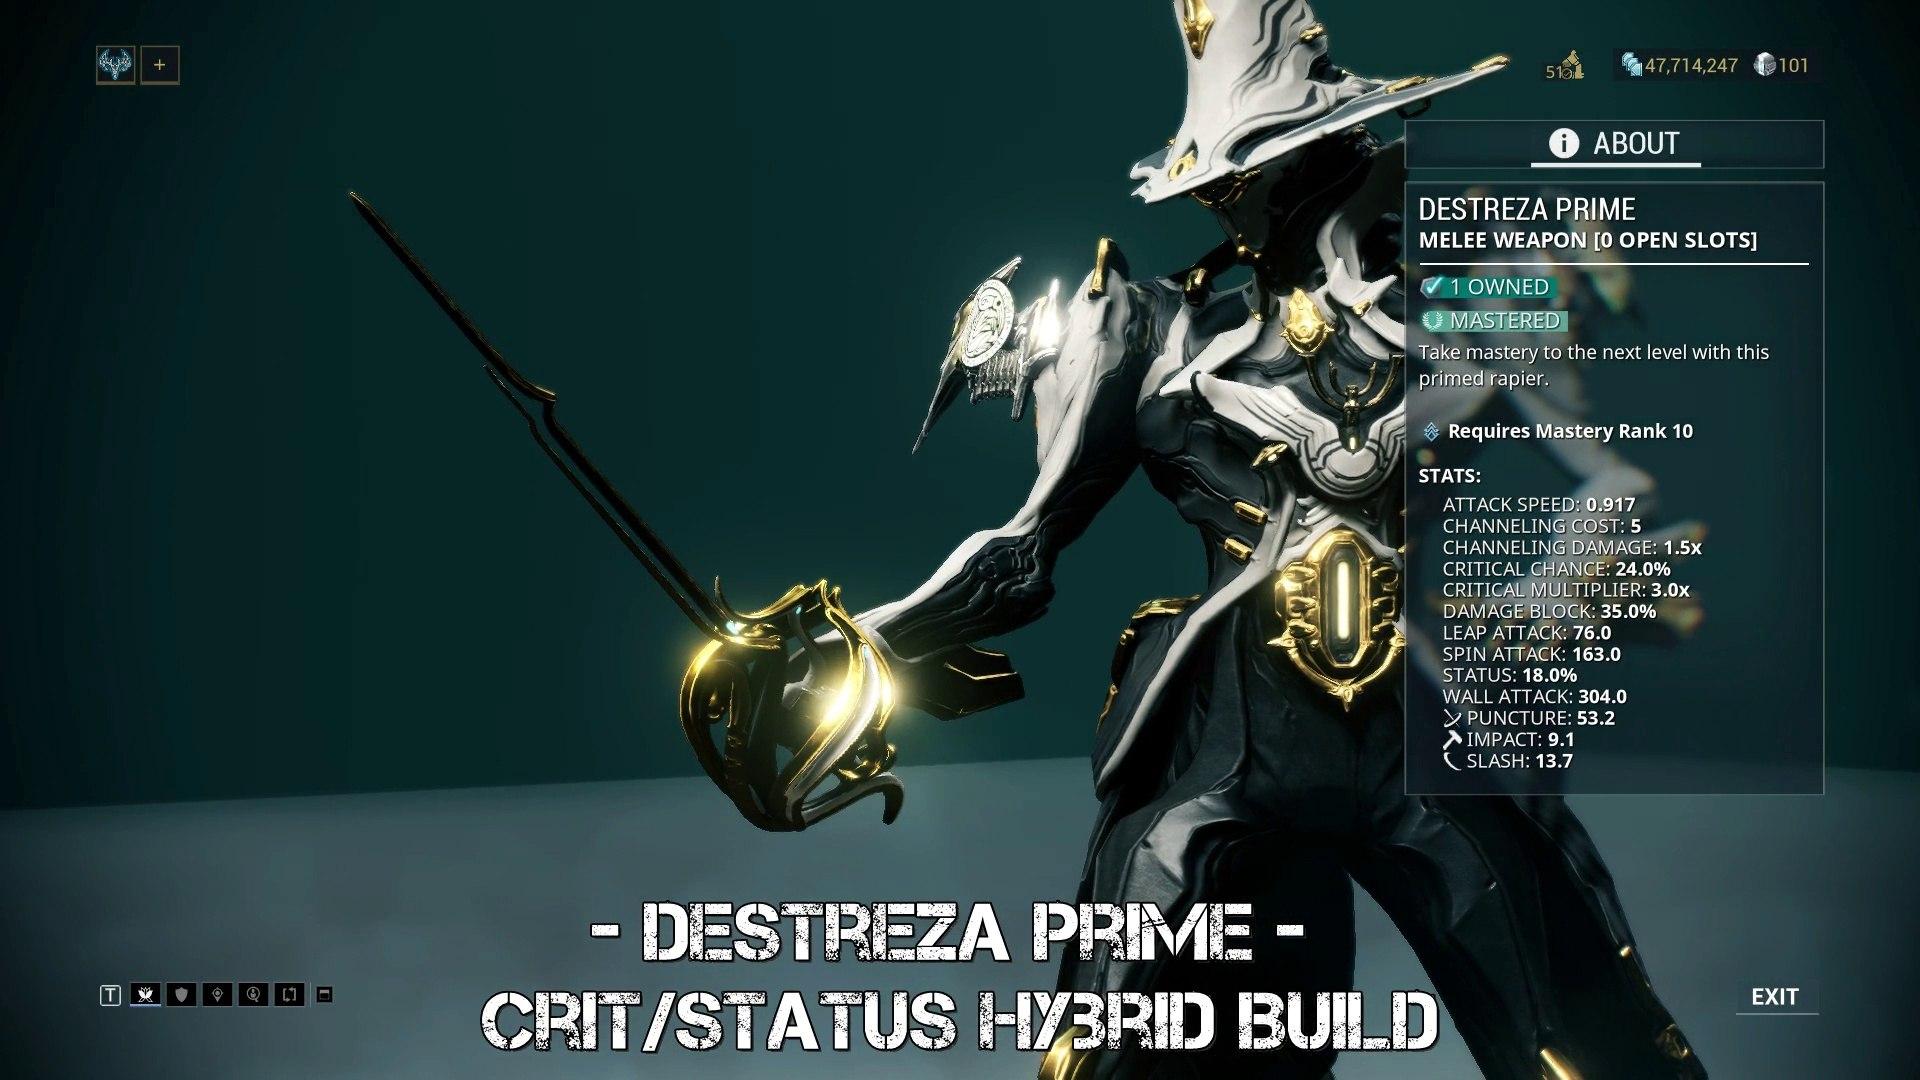 Warframe: Destreza Prime - Crit/Status Hybrid Build - Update 23 0 7+